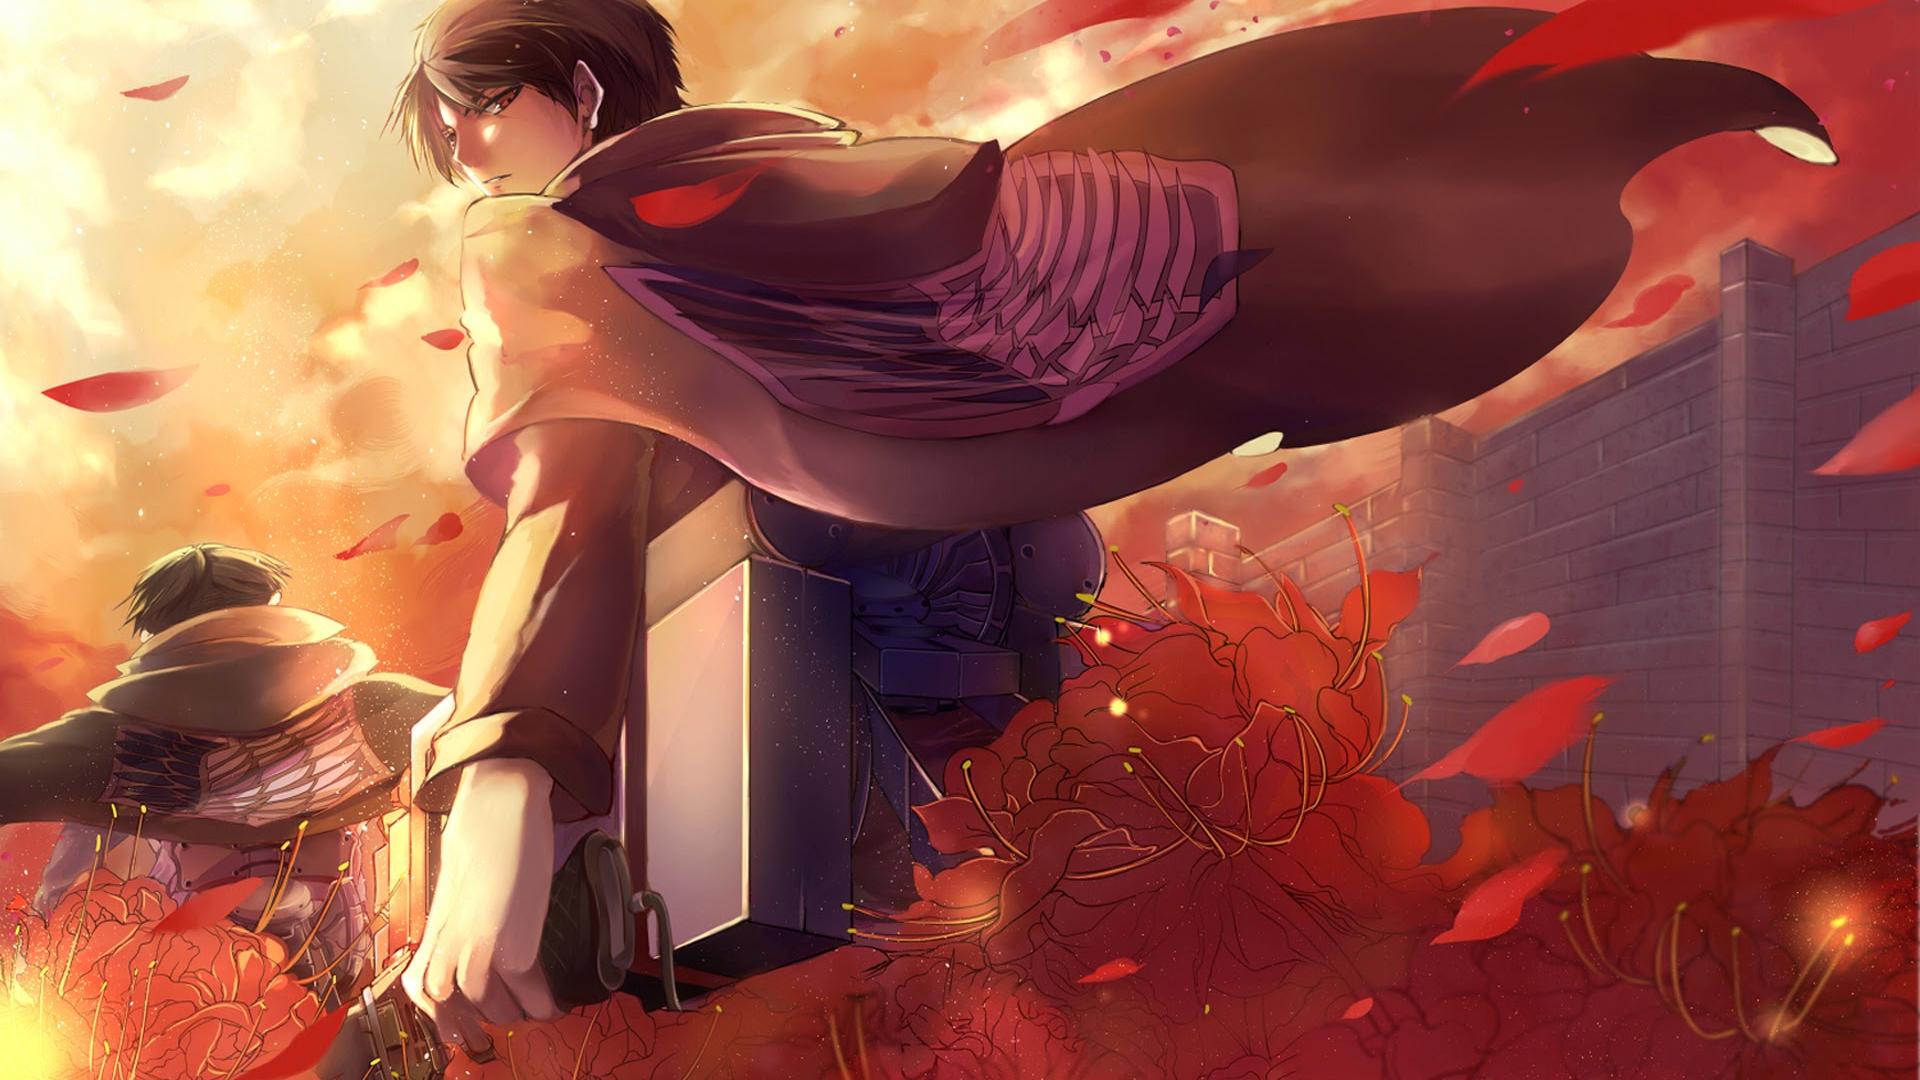 Free Download Eren Jaeger Anime Attack On Titan Shingeki No Kyojin Hd Wallpaper 1920x1200 For Your Desktop Mobile Tablet Explore 49 Attack On Titan Wallpaper Eren Attack On Titan